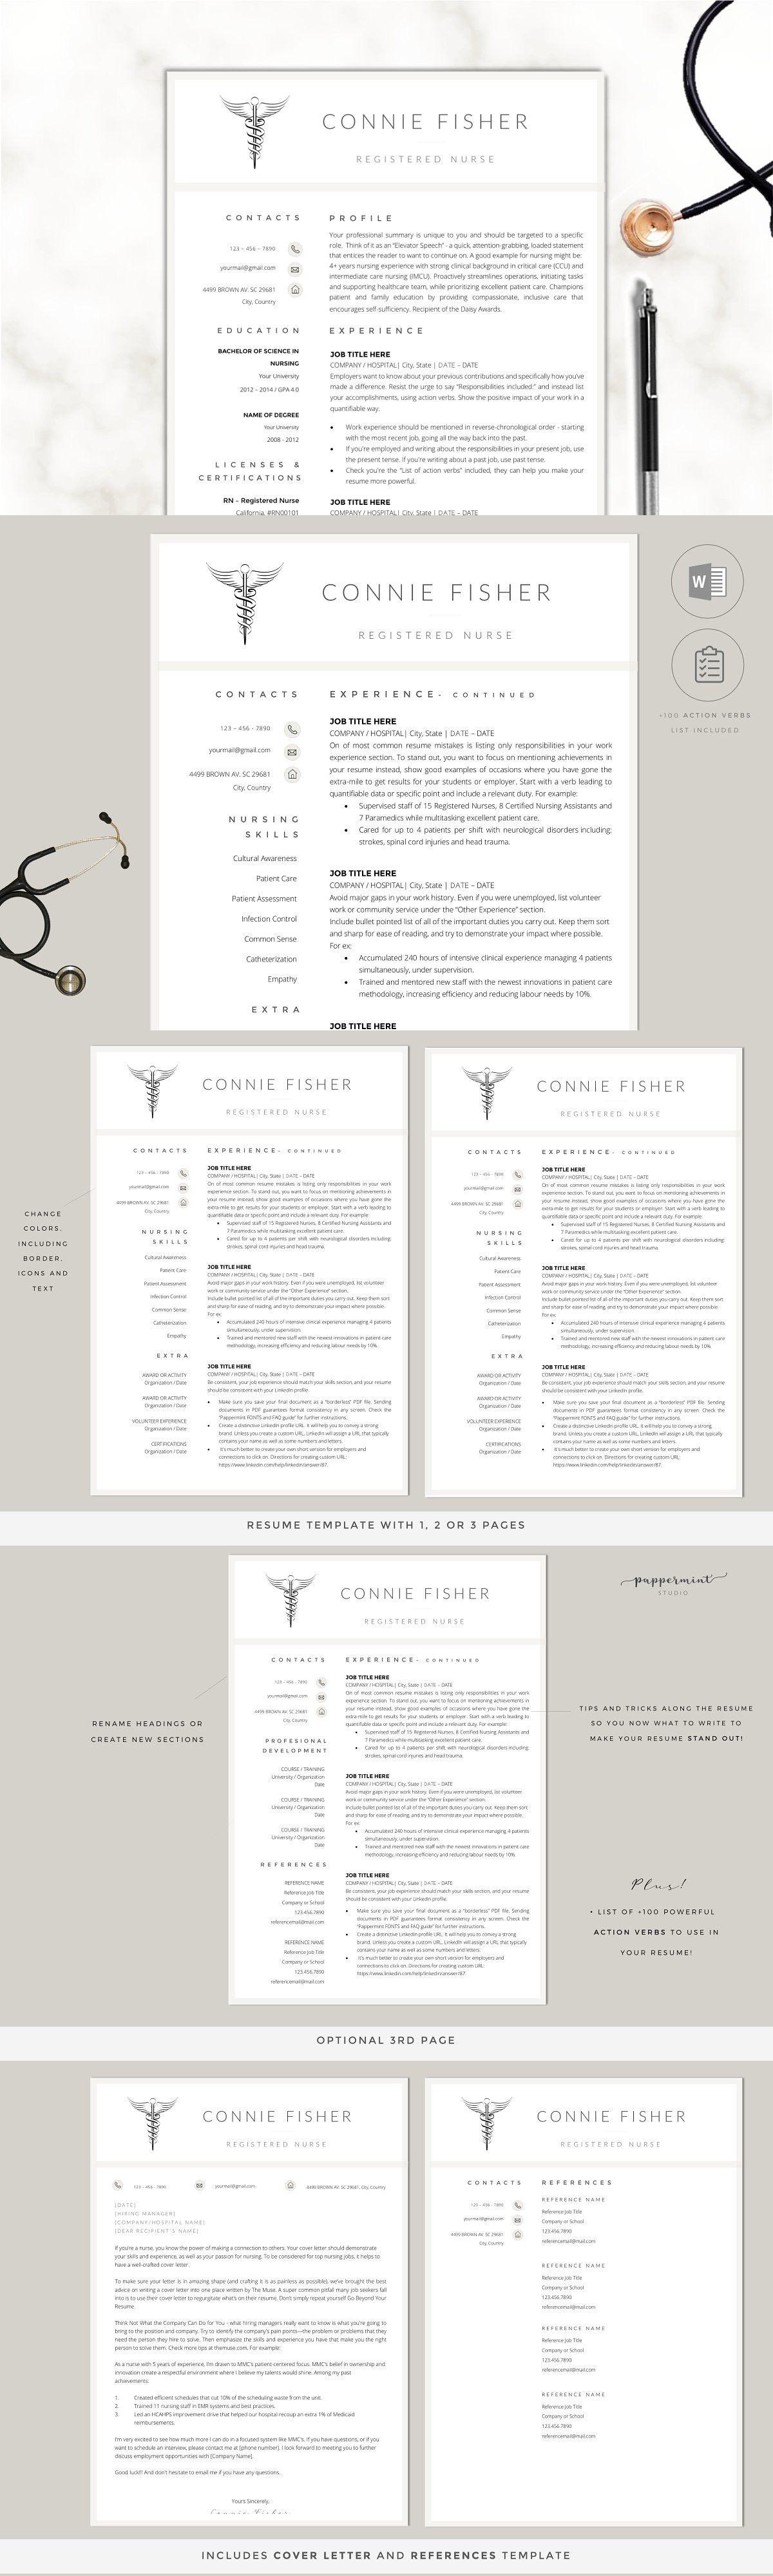 Nurse Resume Template CV in 2020 Nursing resume template